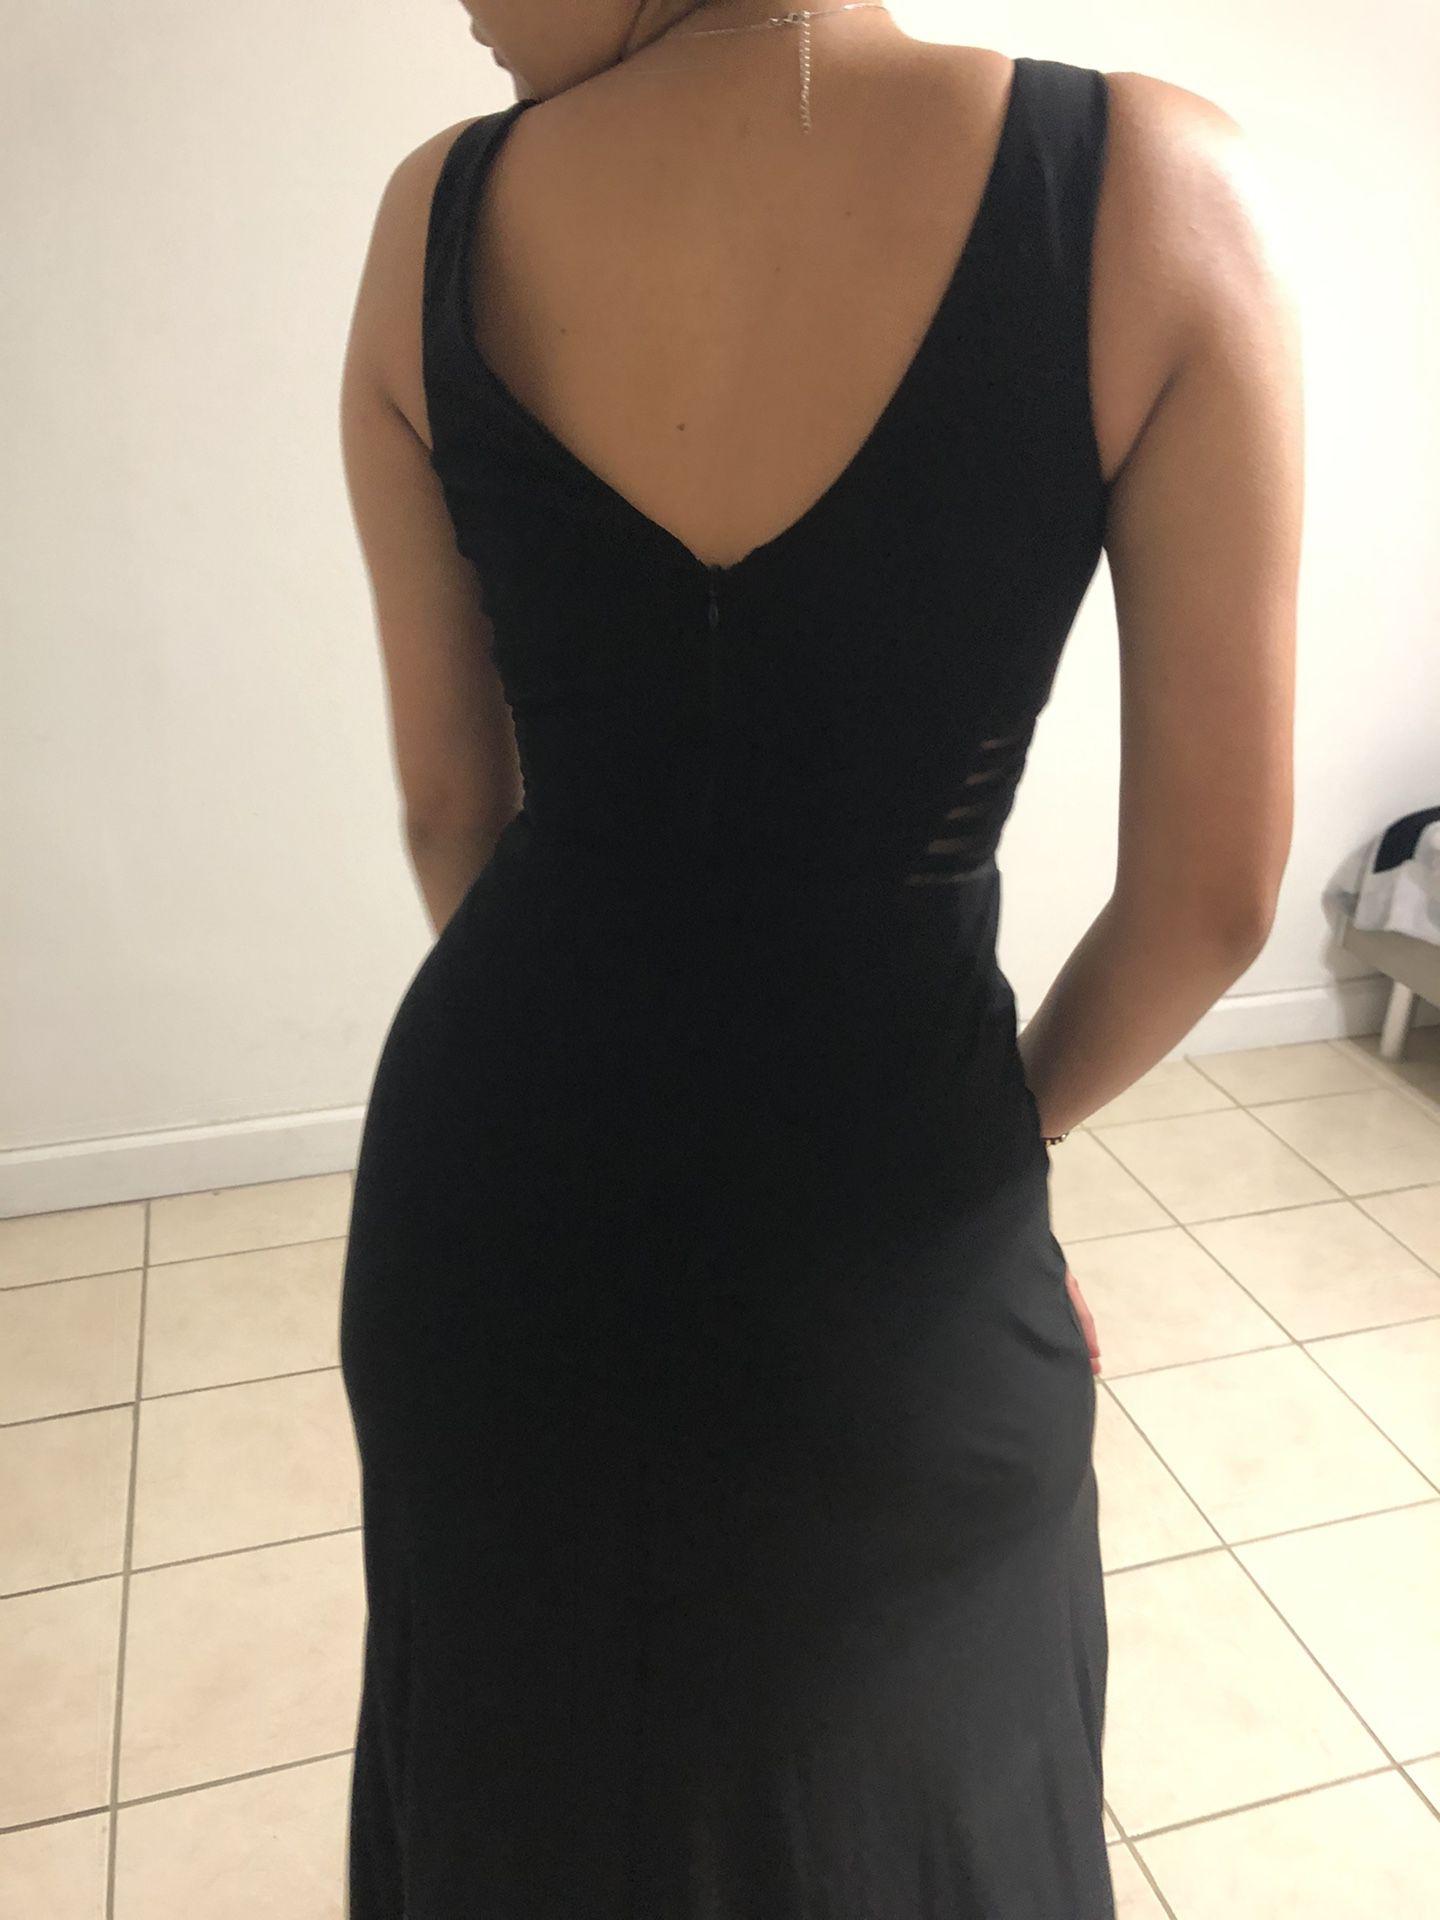 Macy's prom dress